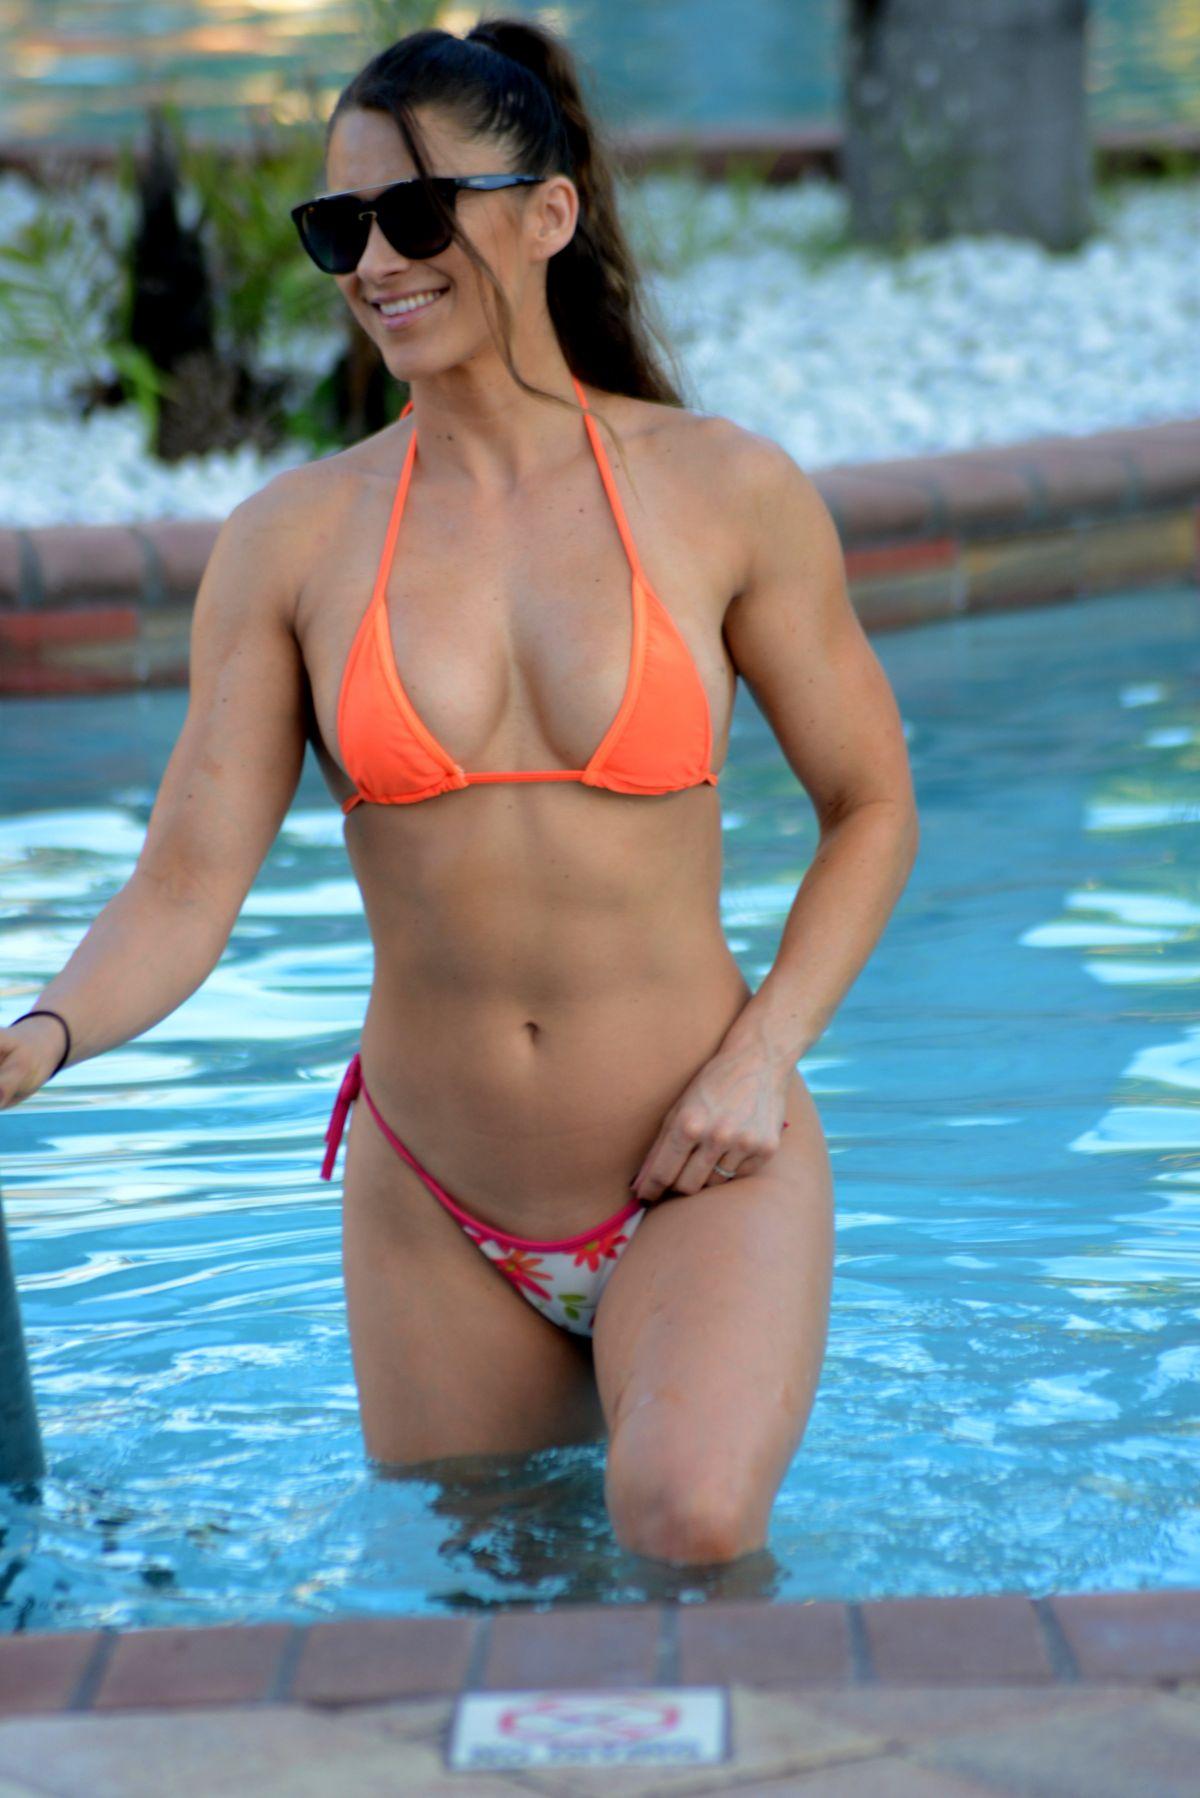 ANAIS ZANOTTI and NICOLE CARDIA in Bikinis at a Pool in